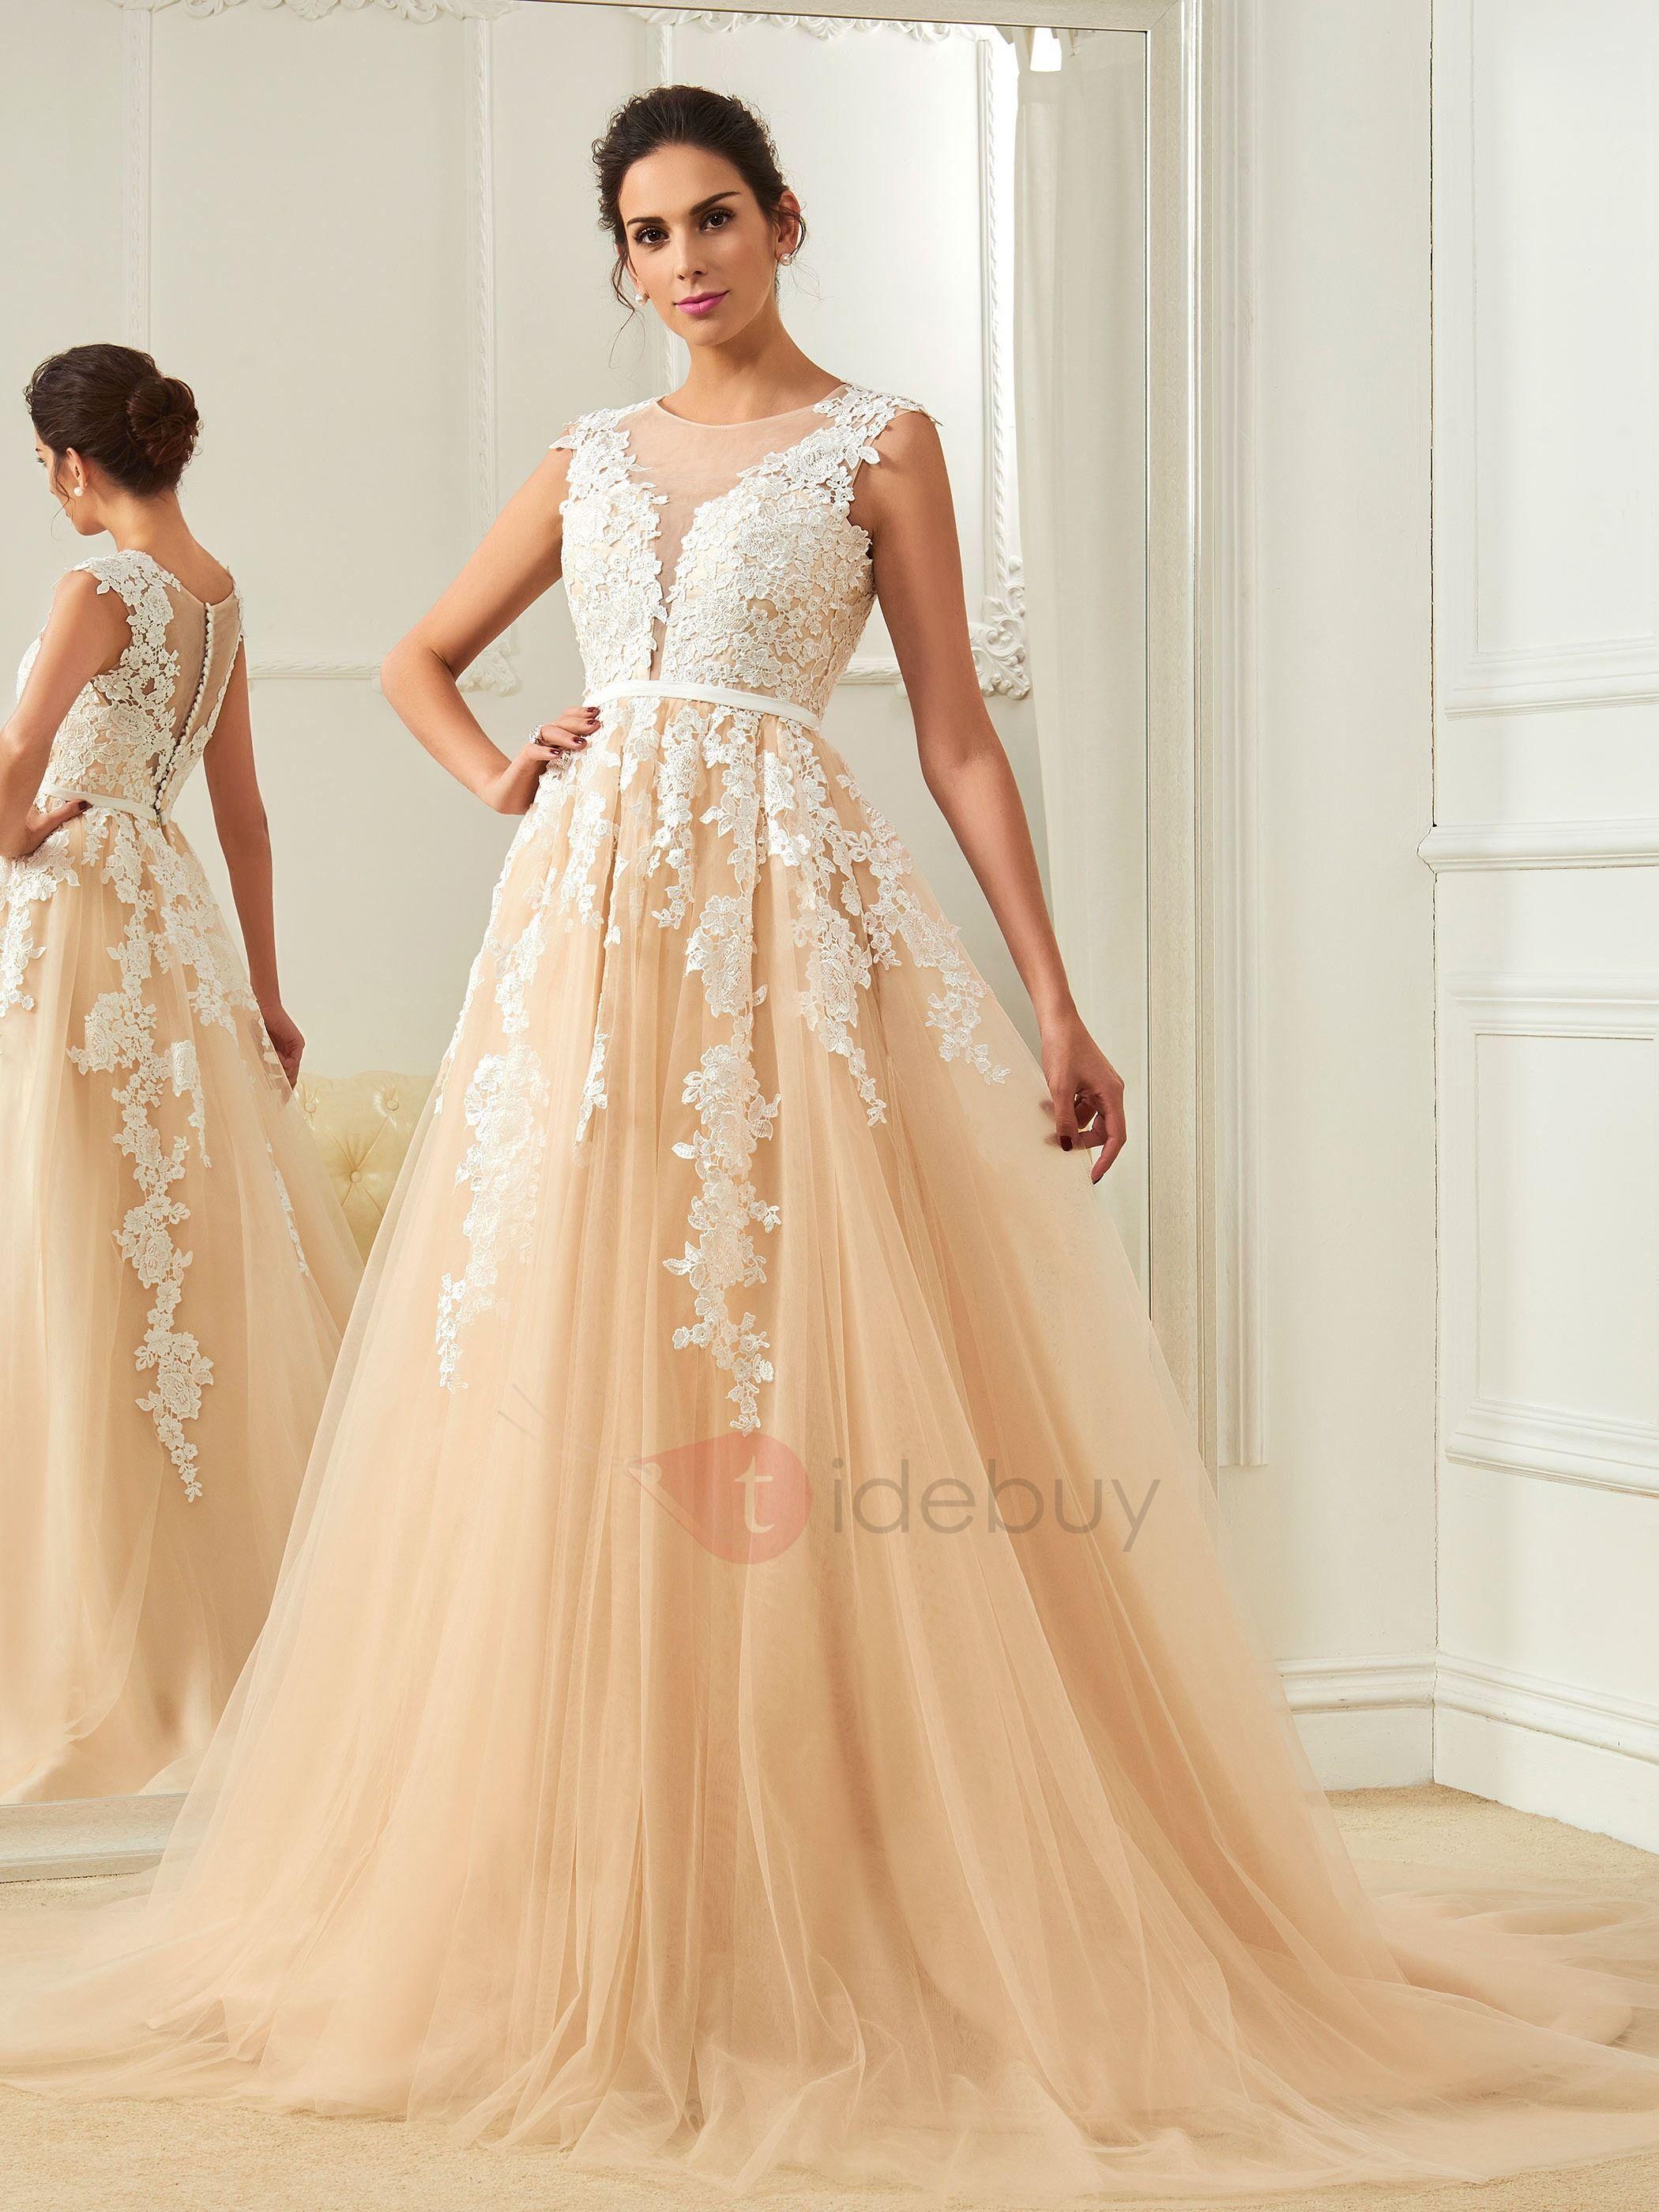 Amazing Scoop Appliques A Line Color Wedding Dress | Colors, We and ...